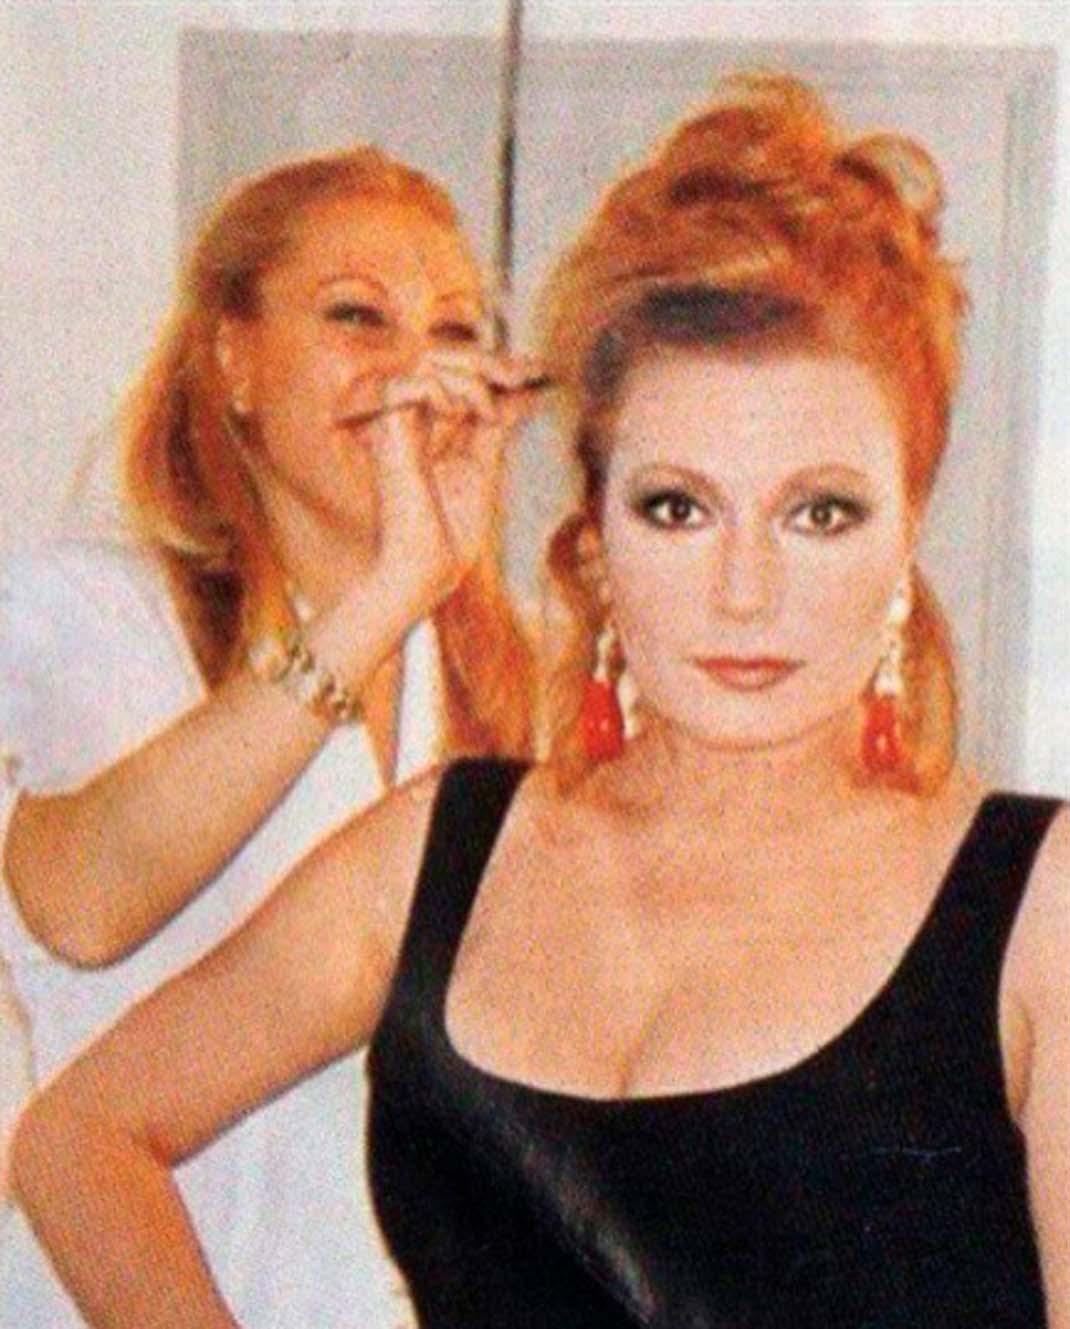 90d4d5517d3c Rosa Benito recuerda su minuto de fama como modelo